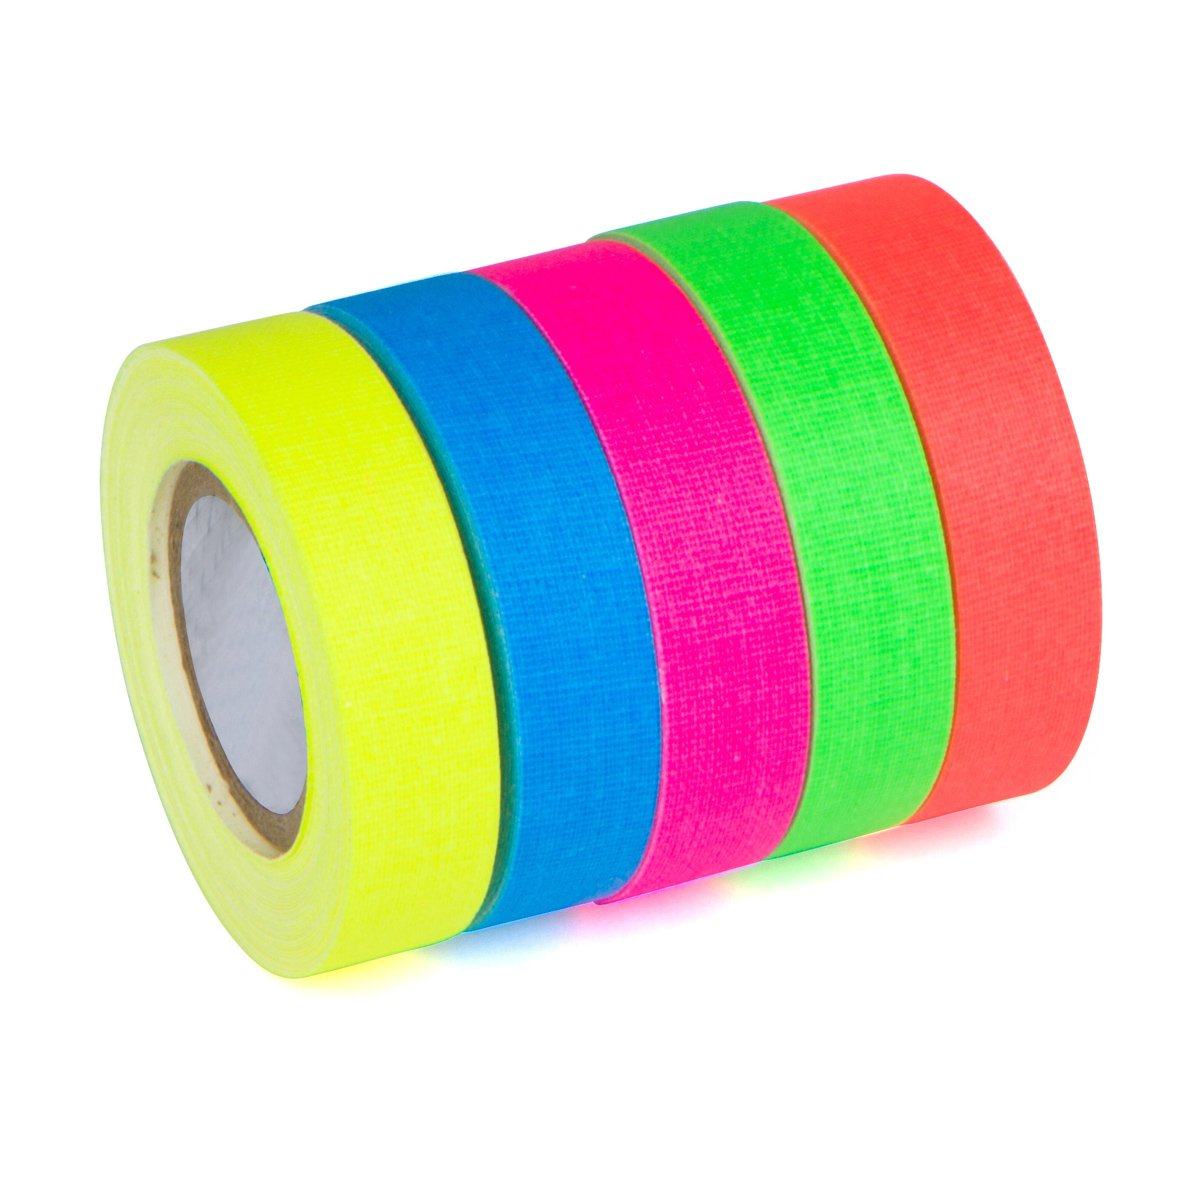 5-Pack SUPER BRIGHT UV Blacklight Reactive Fluorescent / Neon Gaffer Tape Matte Finish by Glow King (Image #2)